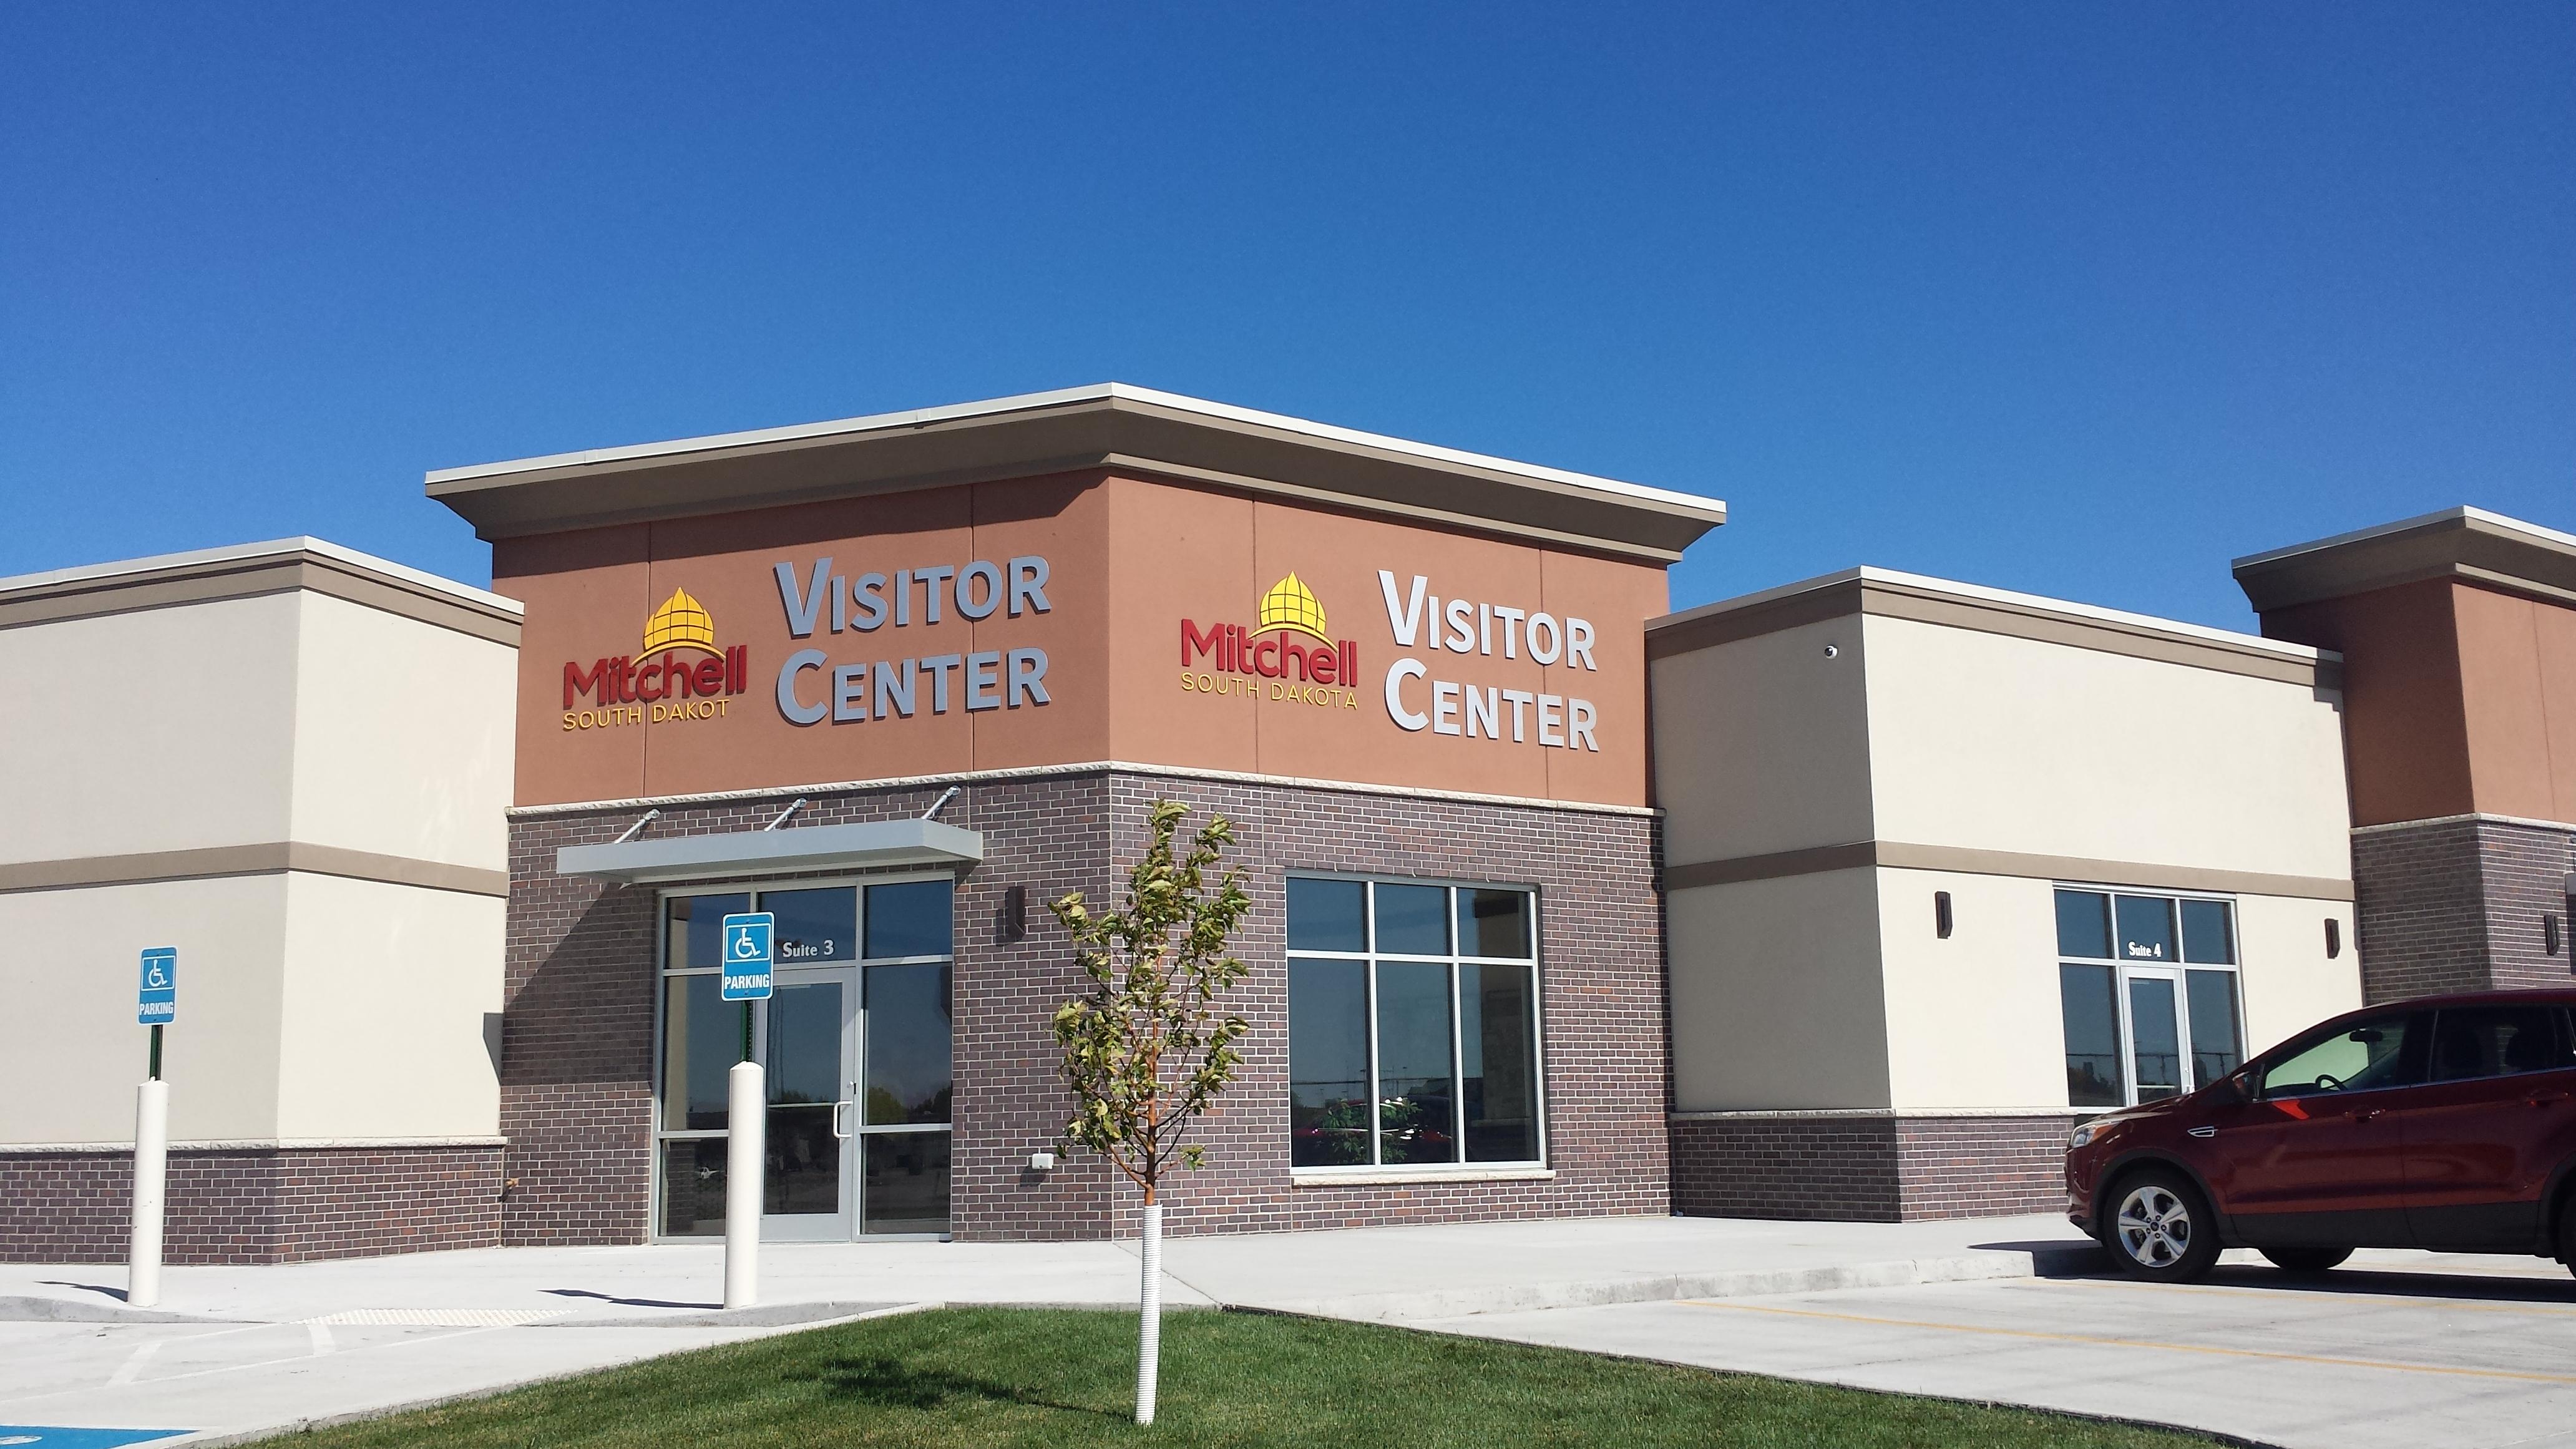 I-90 Visitor Center